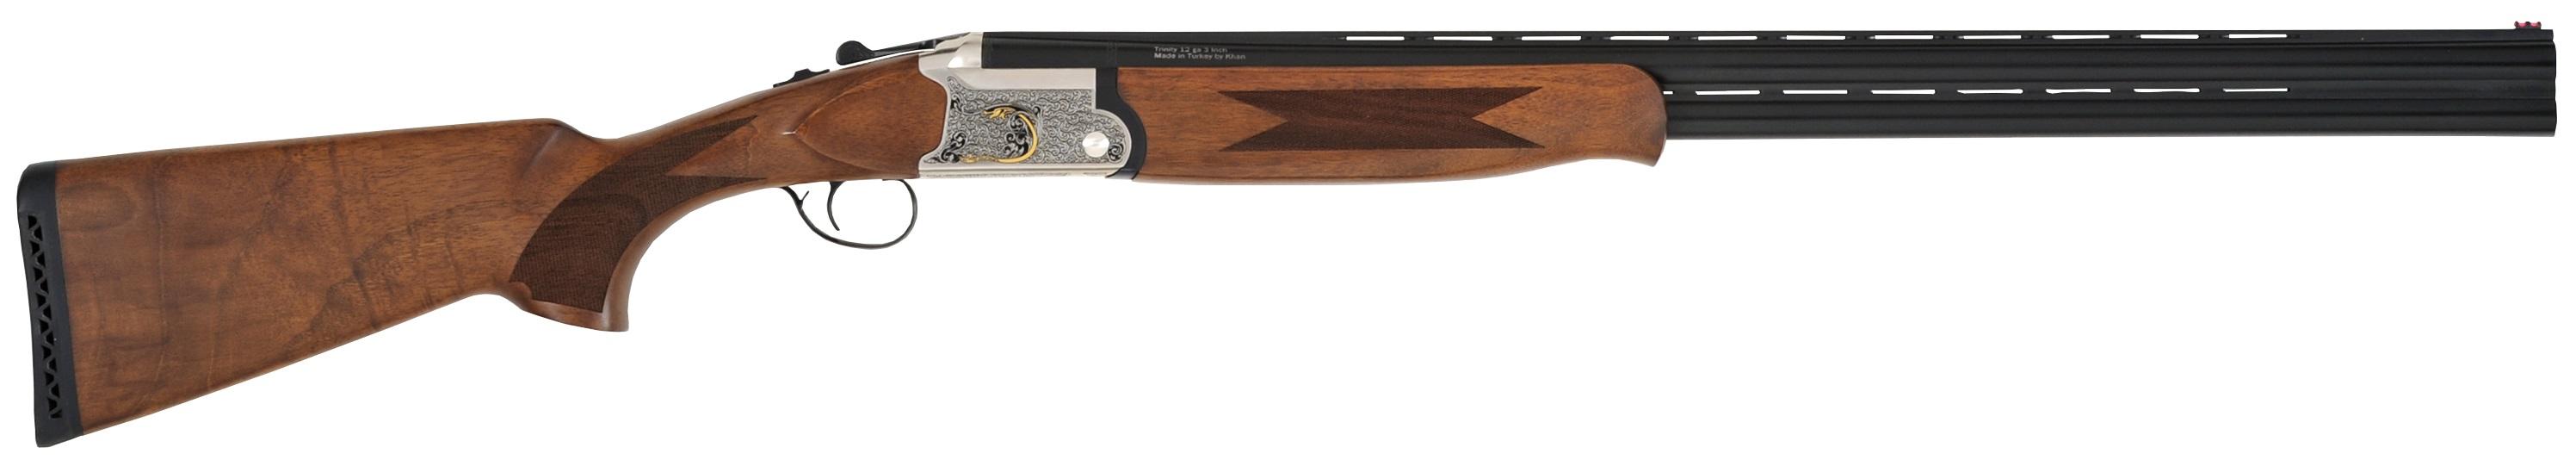 TriStar Sporting Arms Trinity 12 Gauge